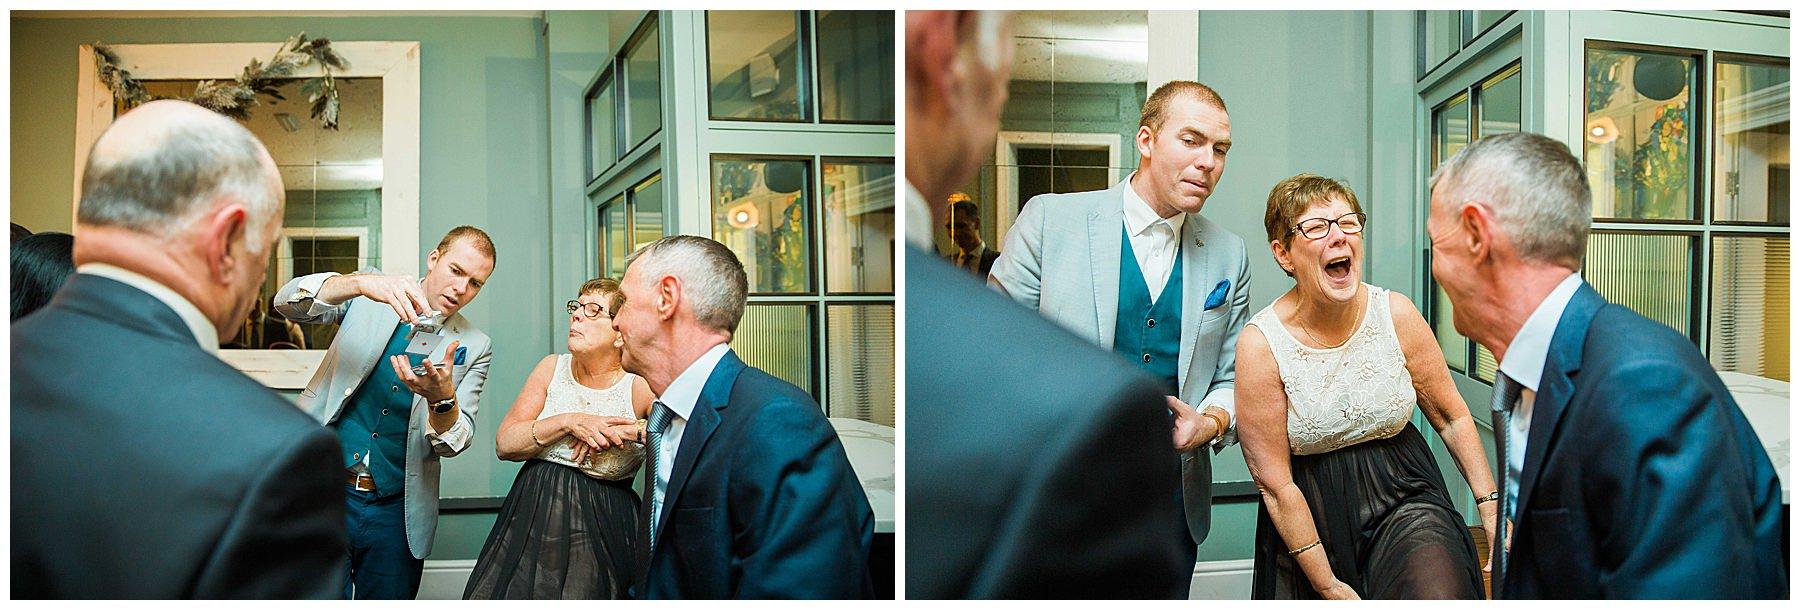 Sam Fitton Magician at Didsbury House Hotel Wedding